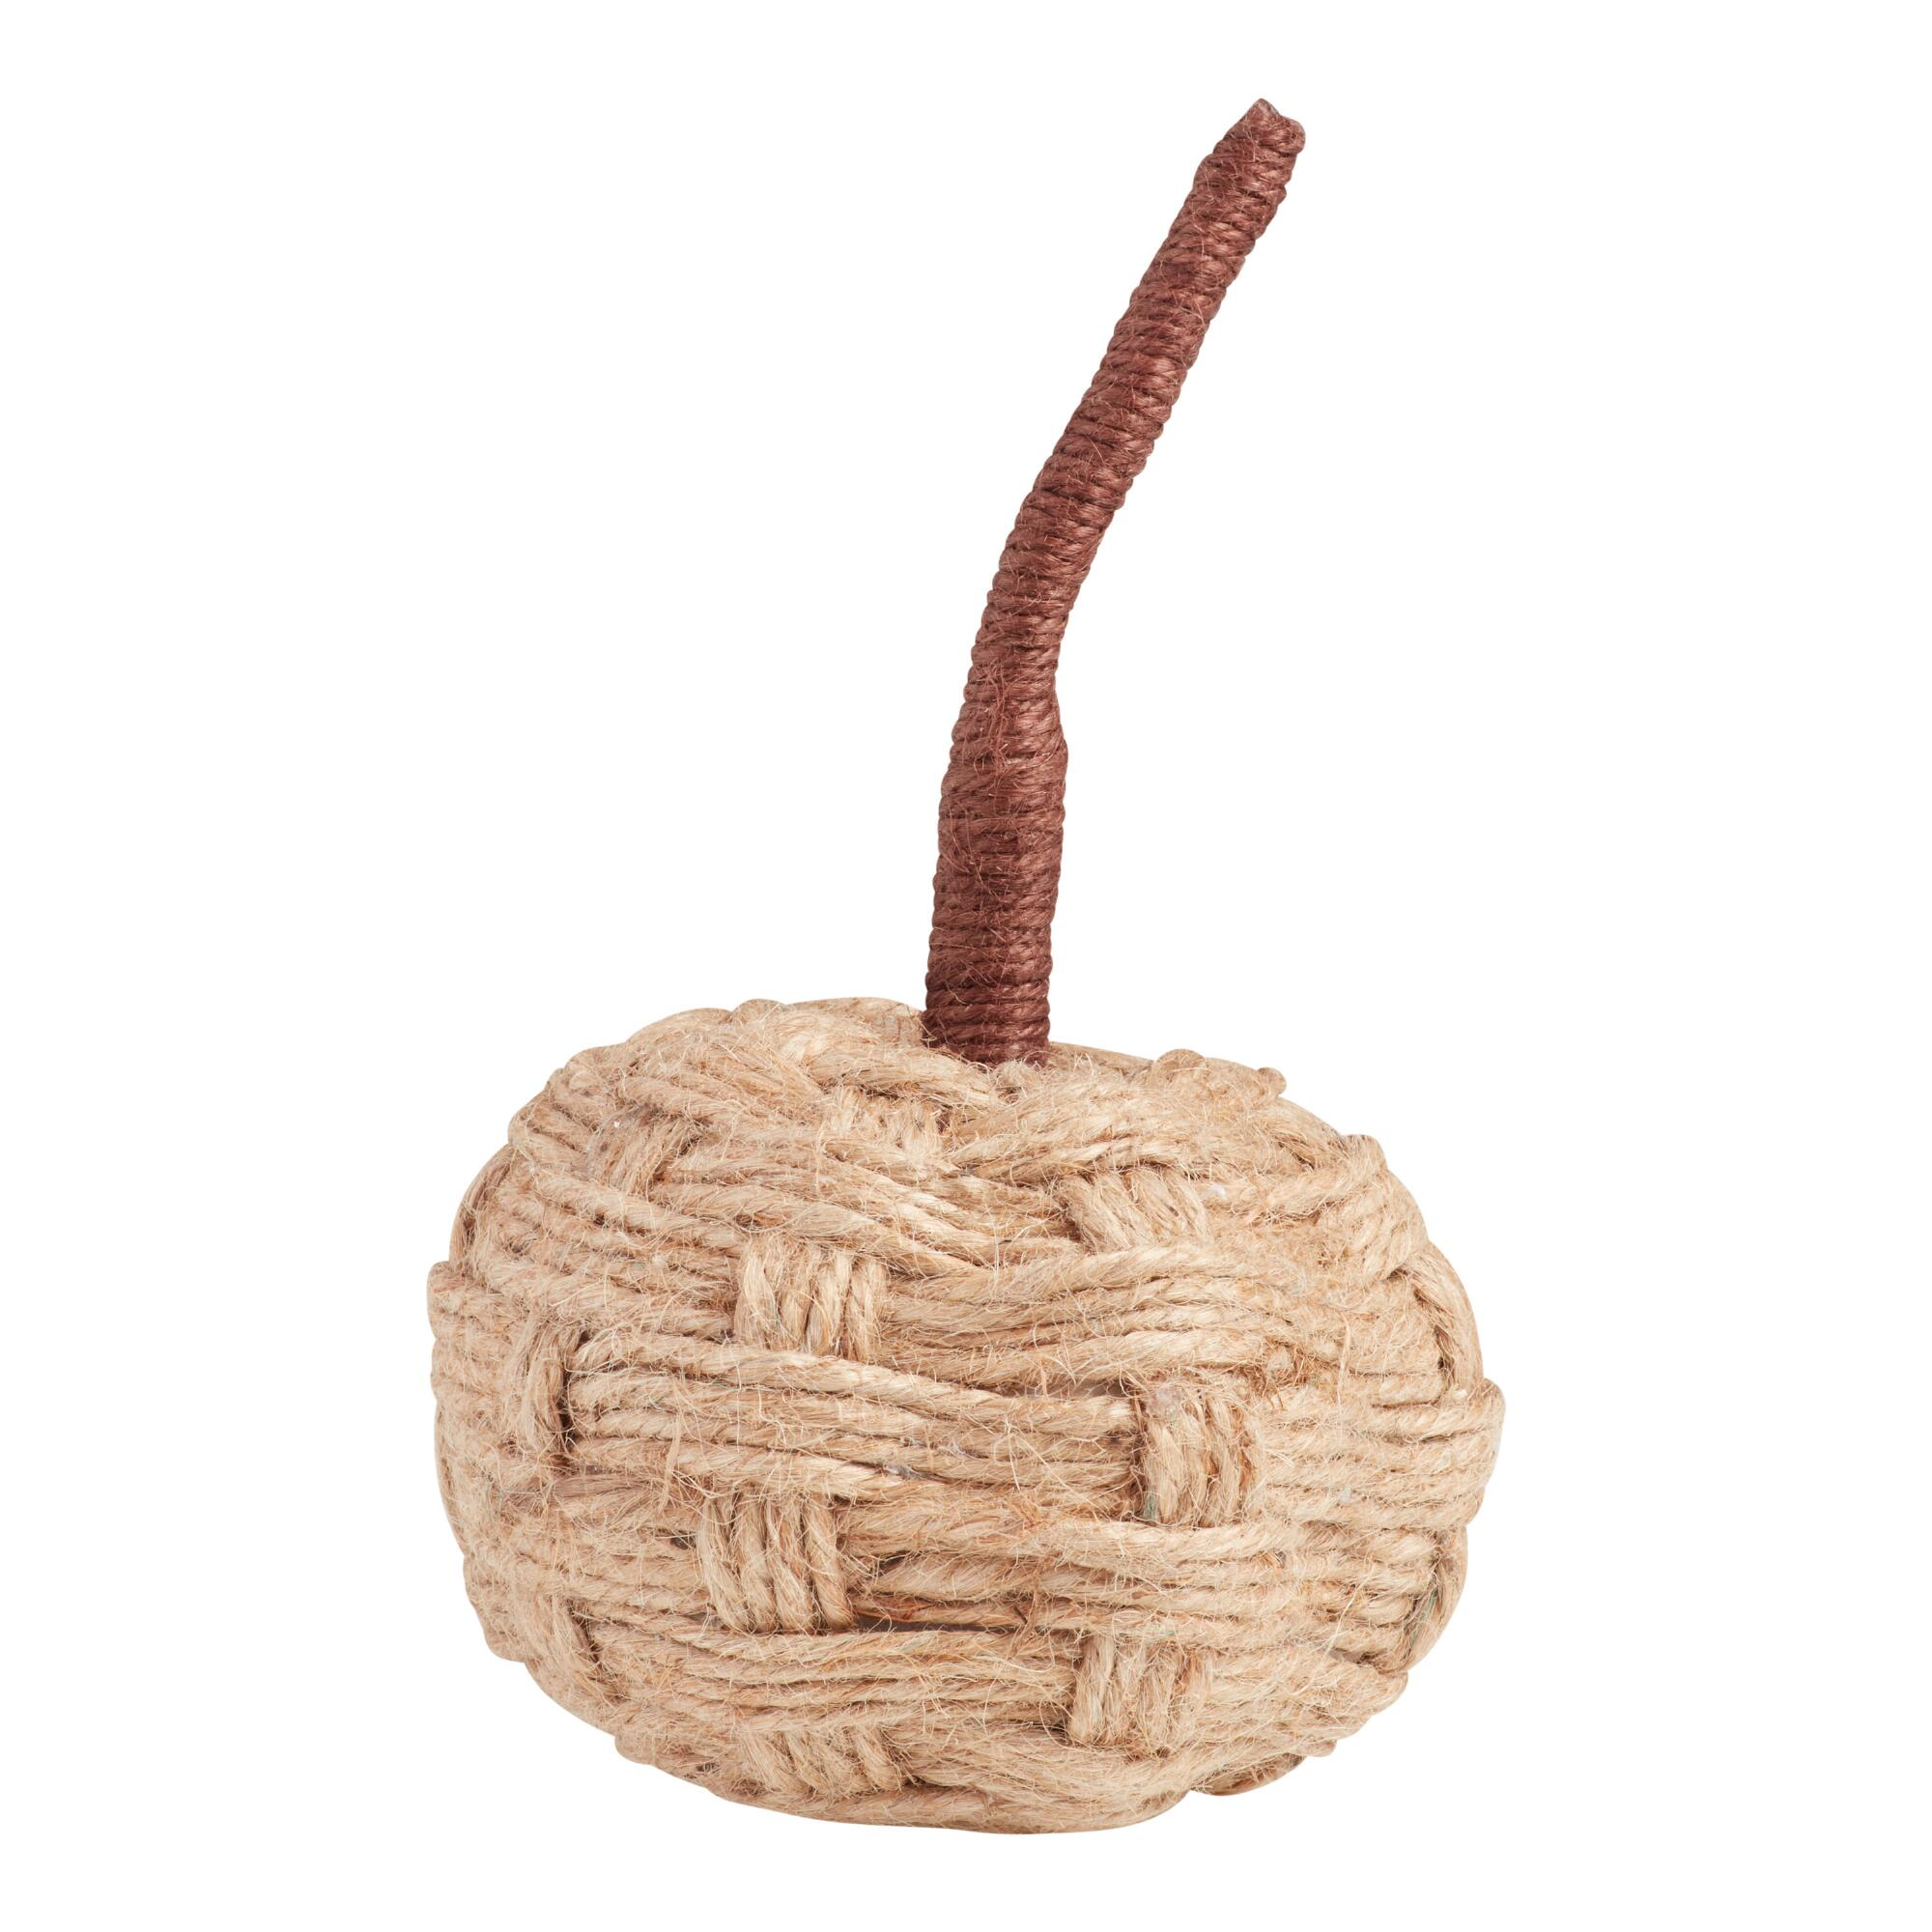 Small Natural Jute Wrapped Pumpkin Decor $4.99